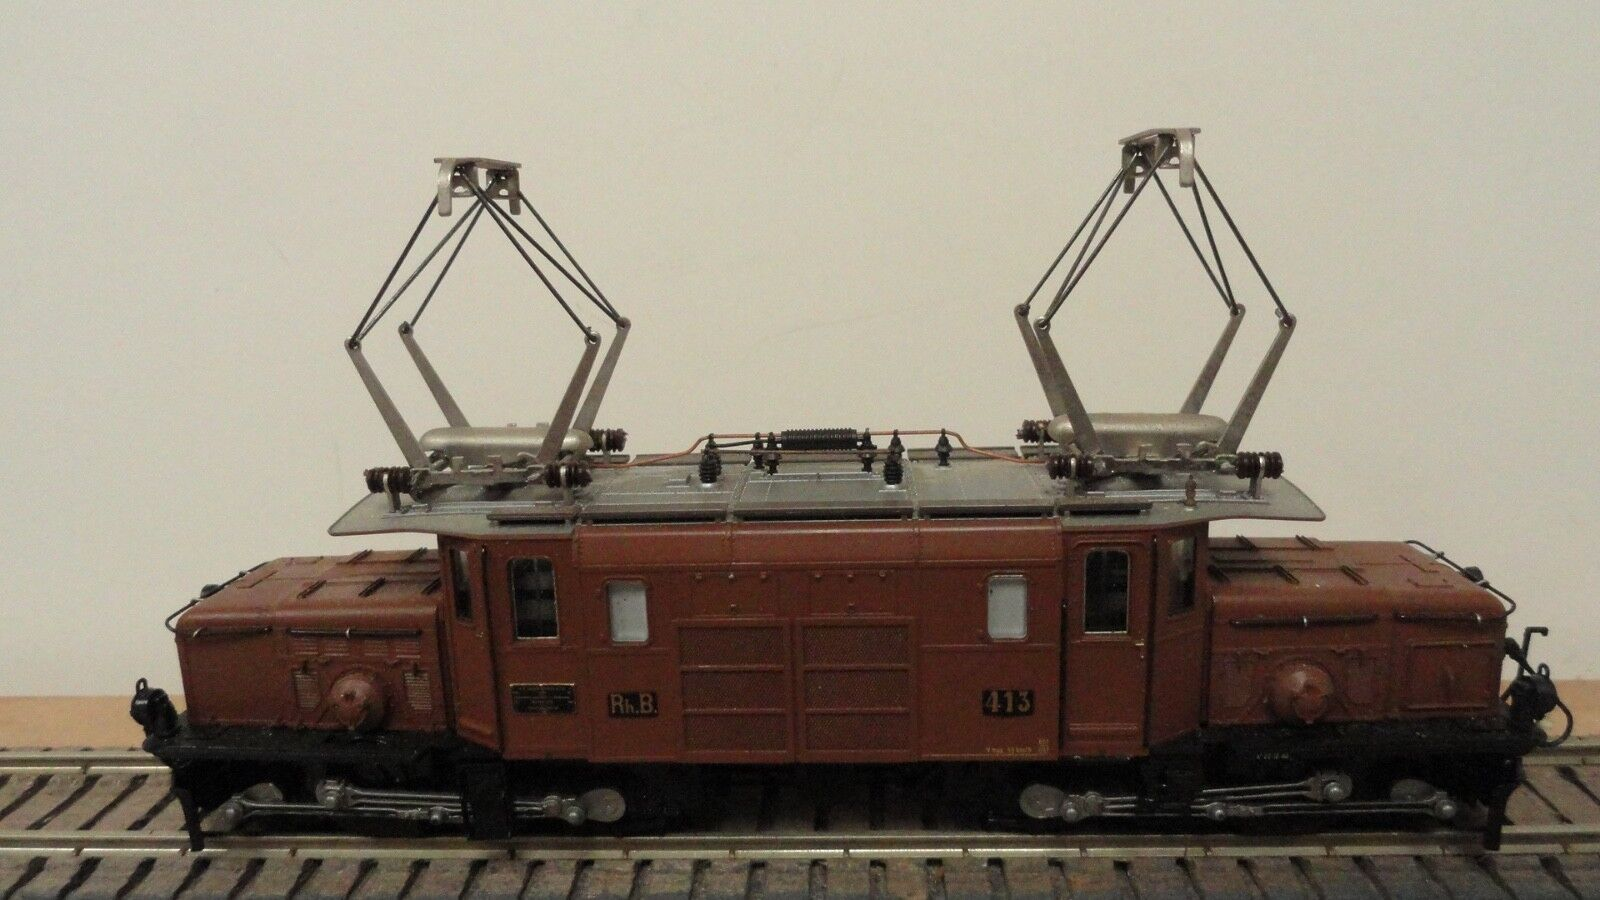 Bemo HOm J737 RhB  413 Ge 6/6 I  Crocodile  electric loco. No original box.